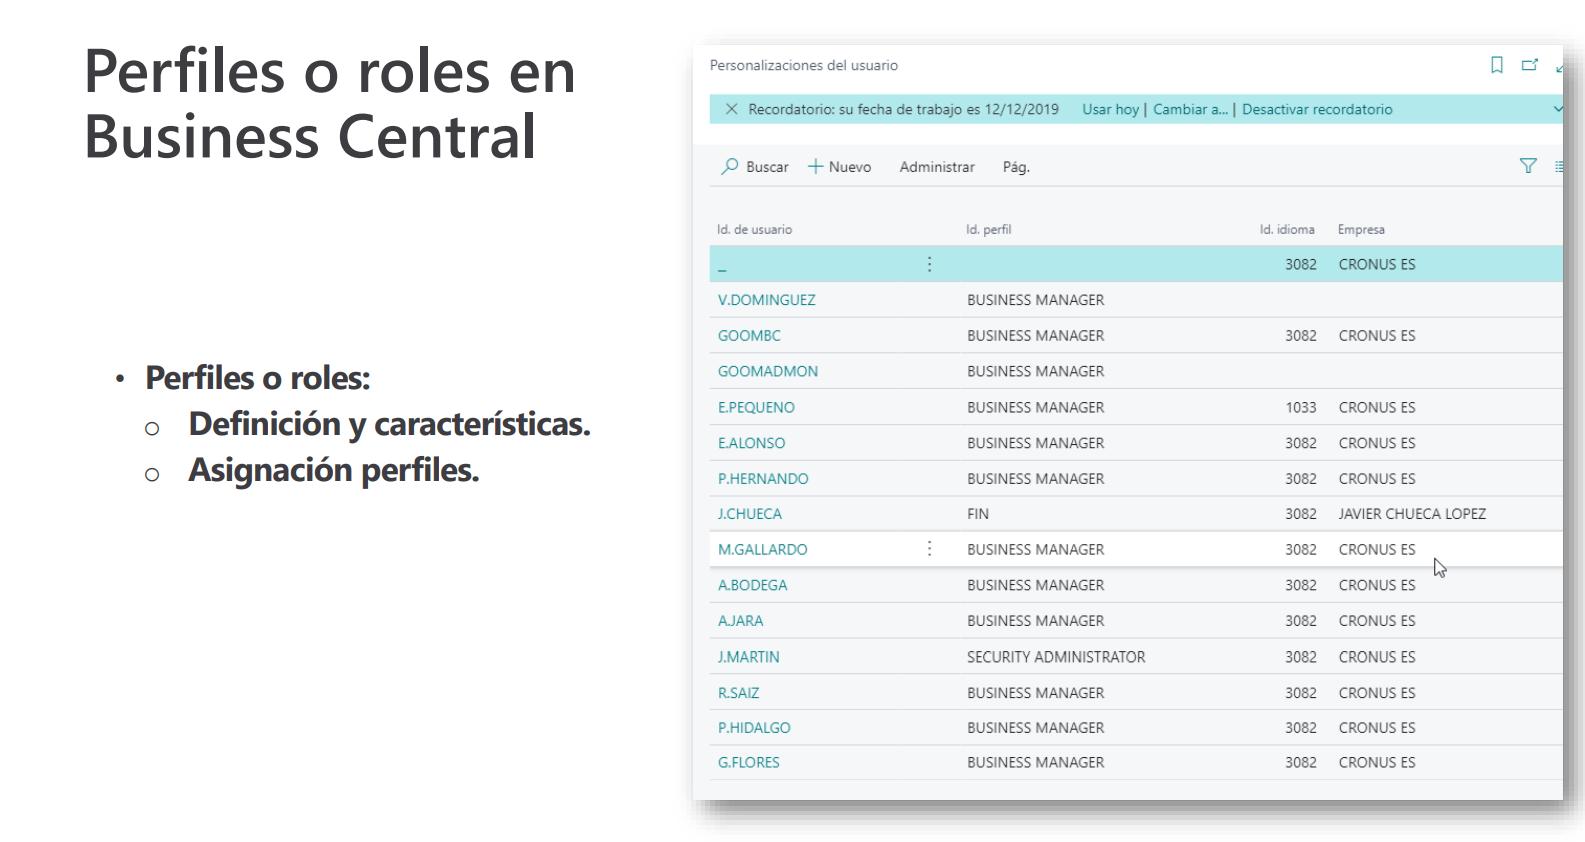 webinar_roles_permisos_business_central_3